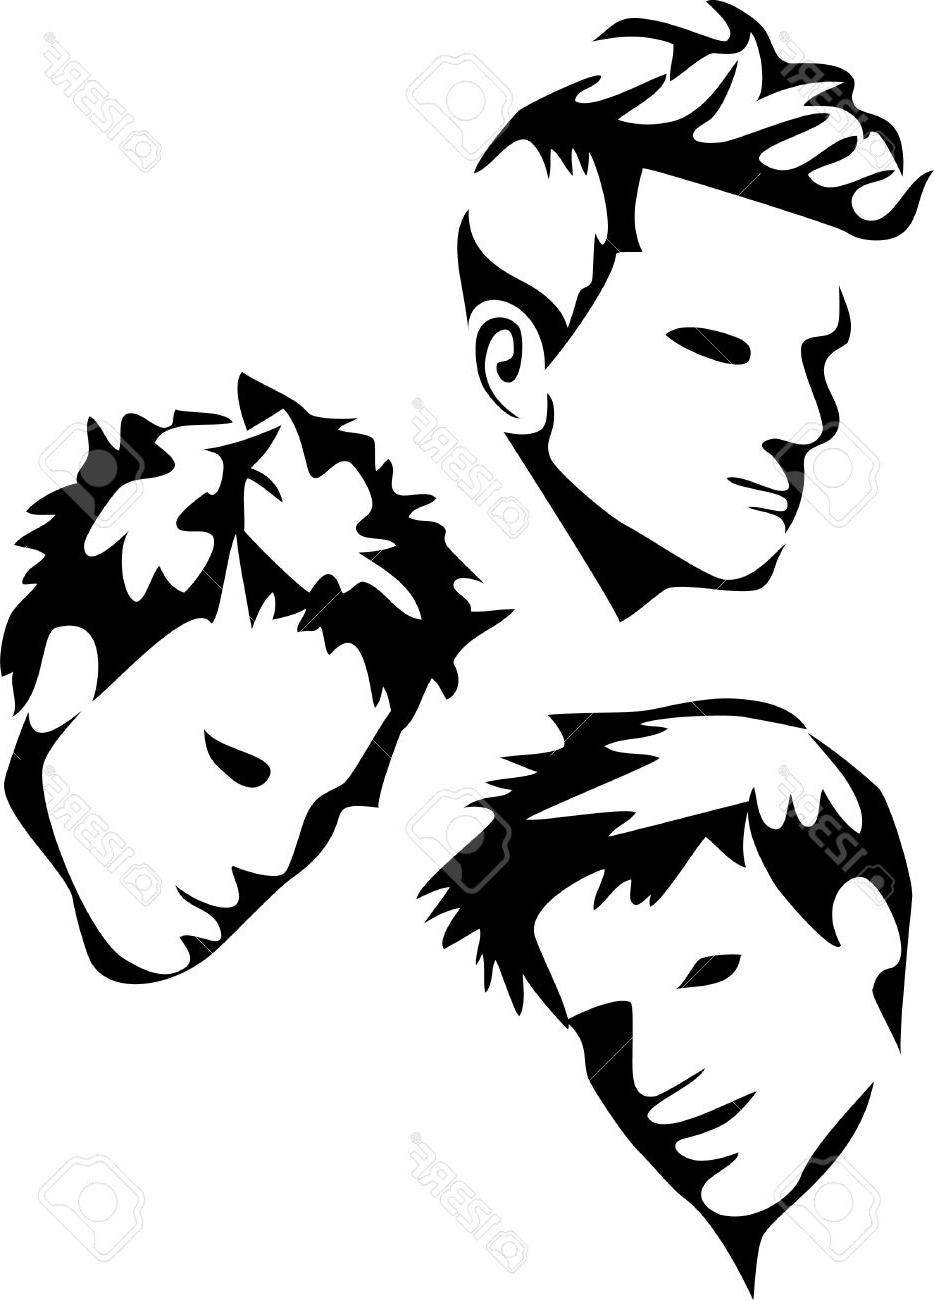 934x1300 Best 15 Men Hair Styles Stock Vector Haircut Cdr